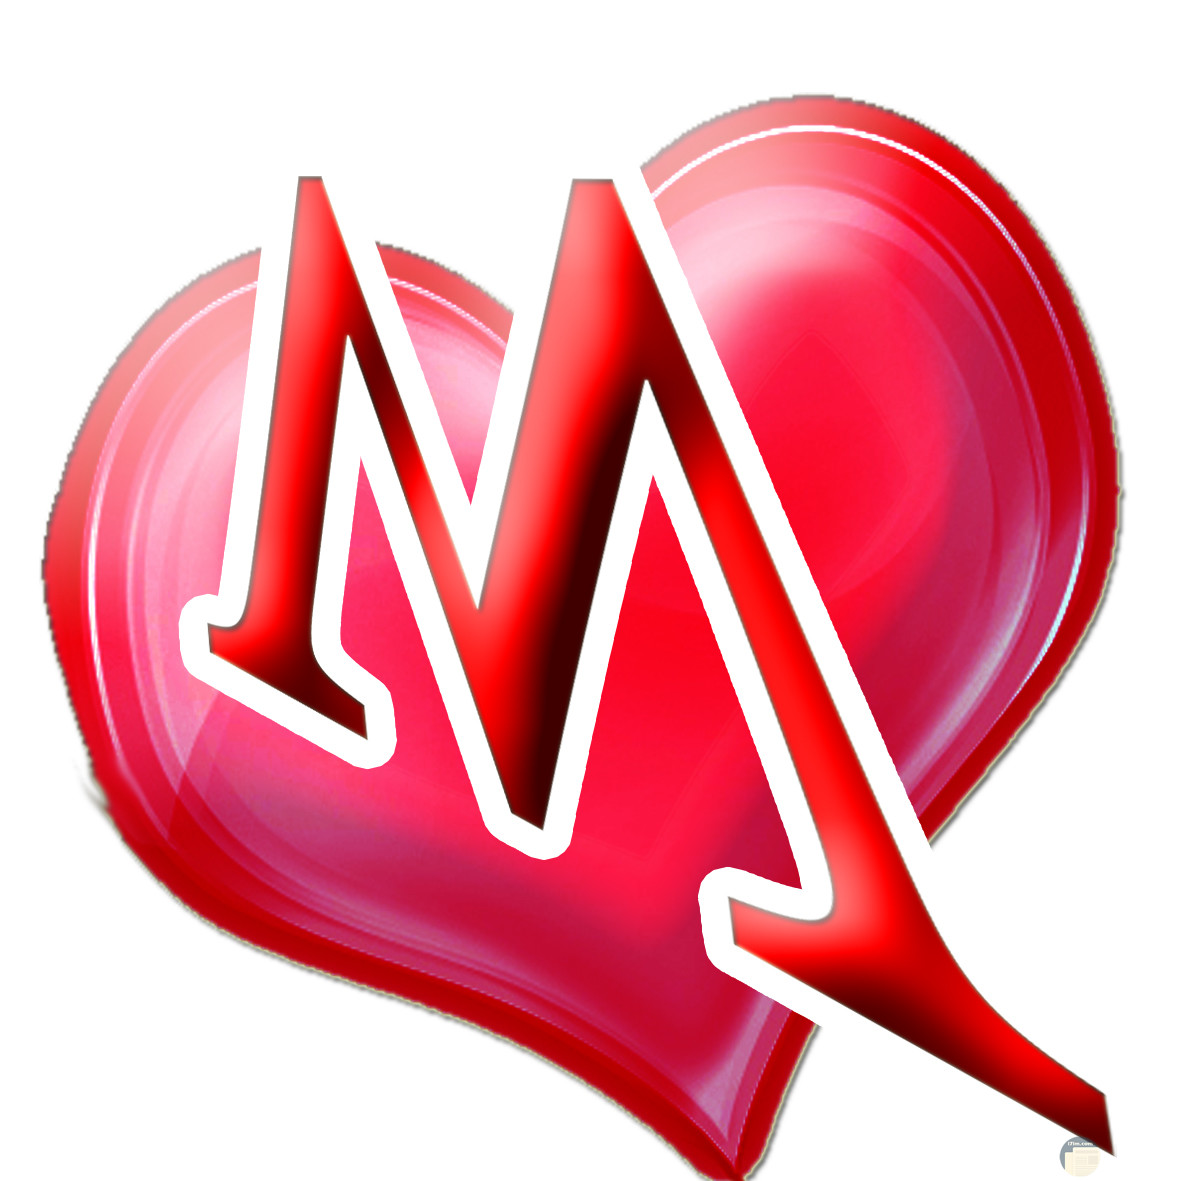 حرف M داخل قلب أحمر